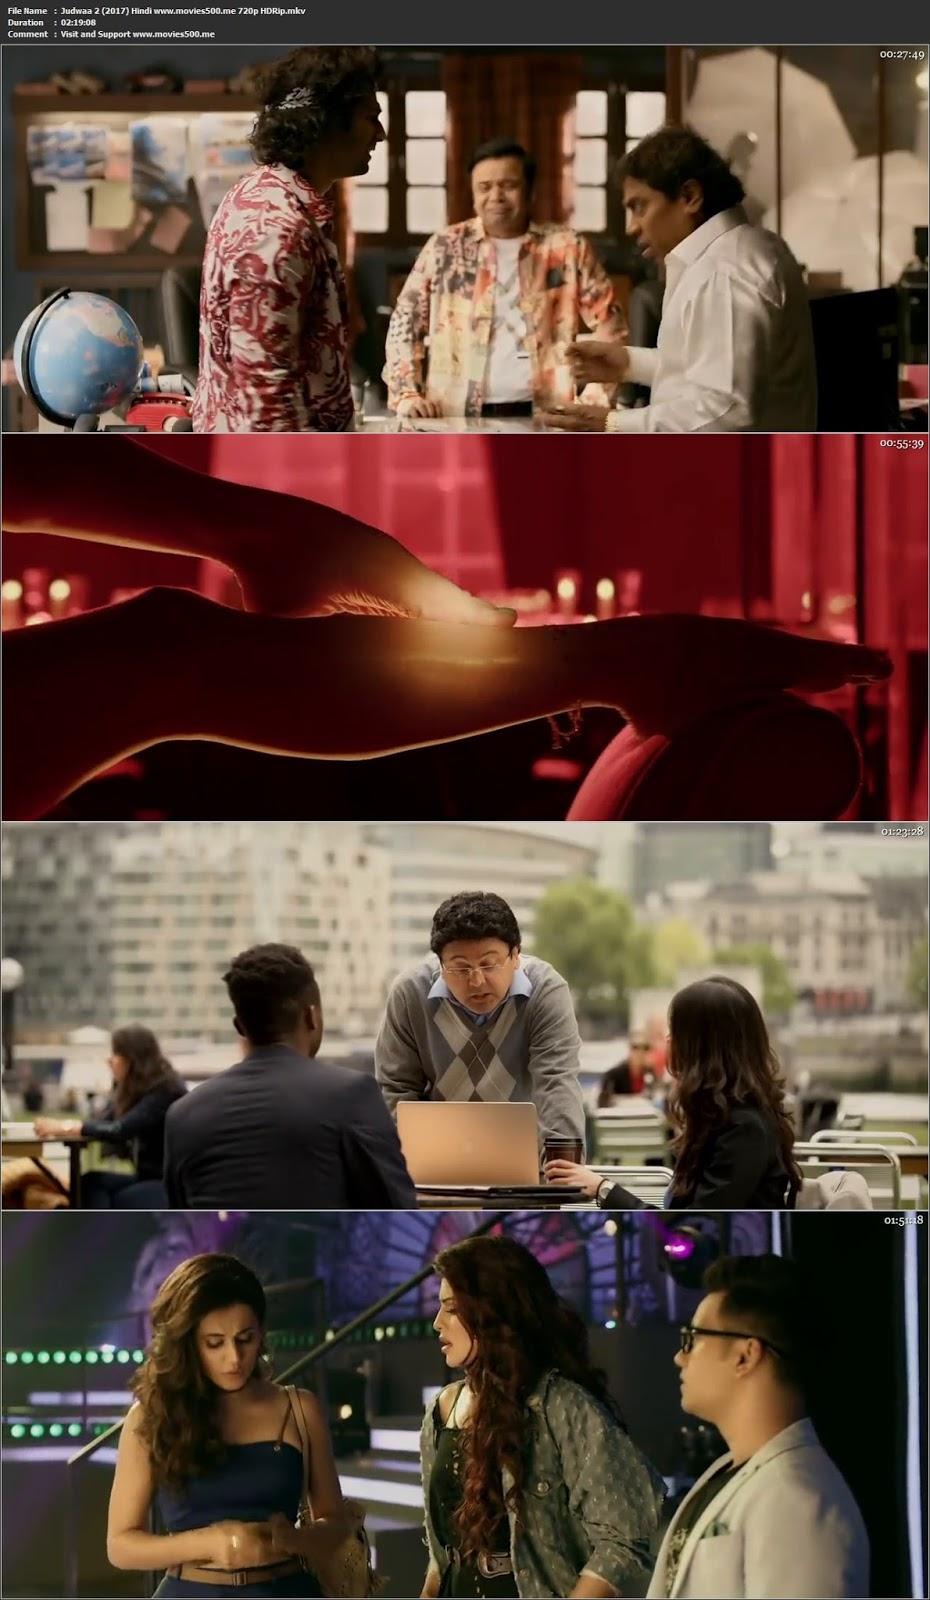 Judwaa 2 2017 Hindi Full Movie HDRip 720p 1GB at softwaresonly.com